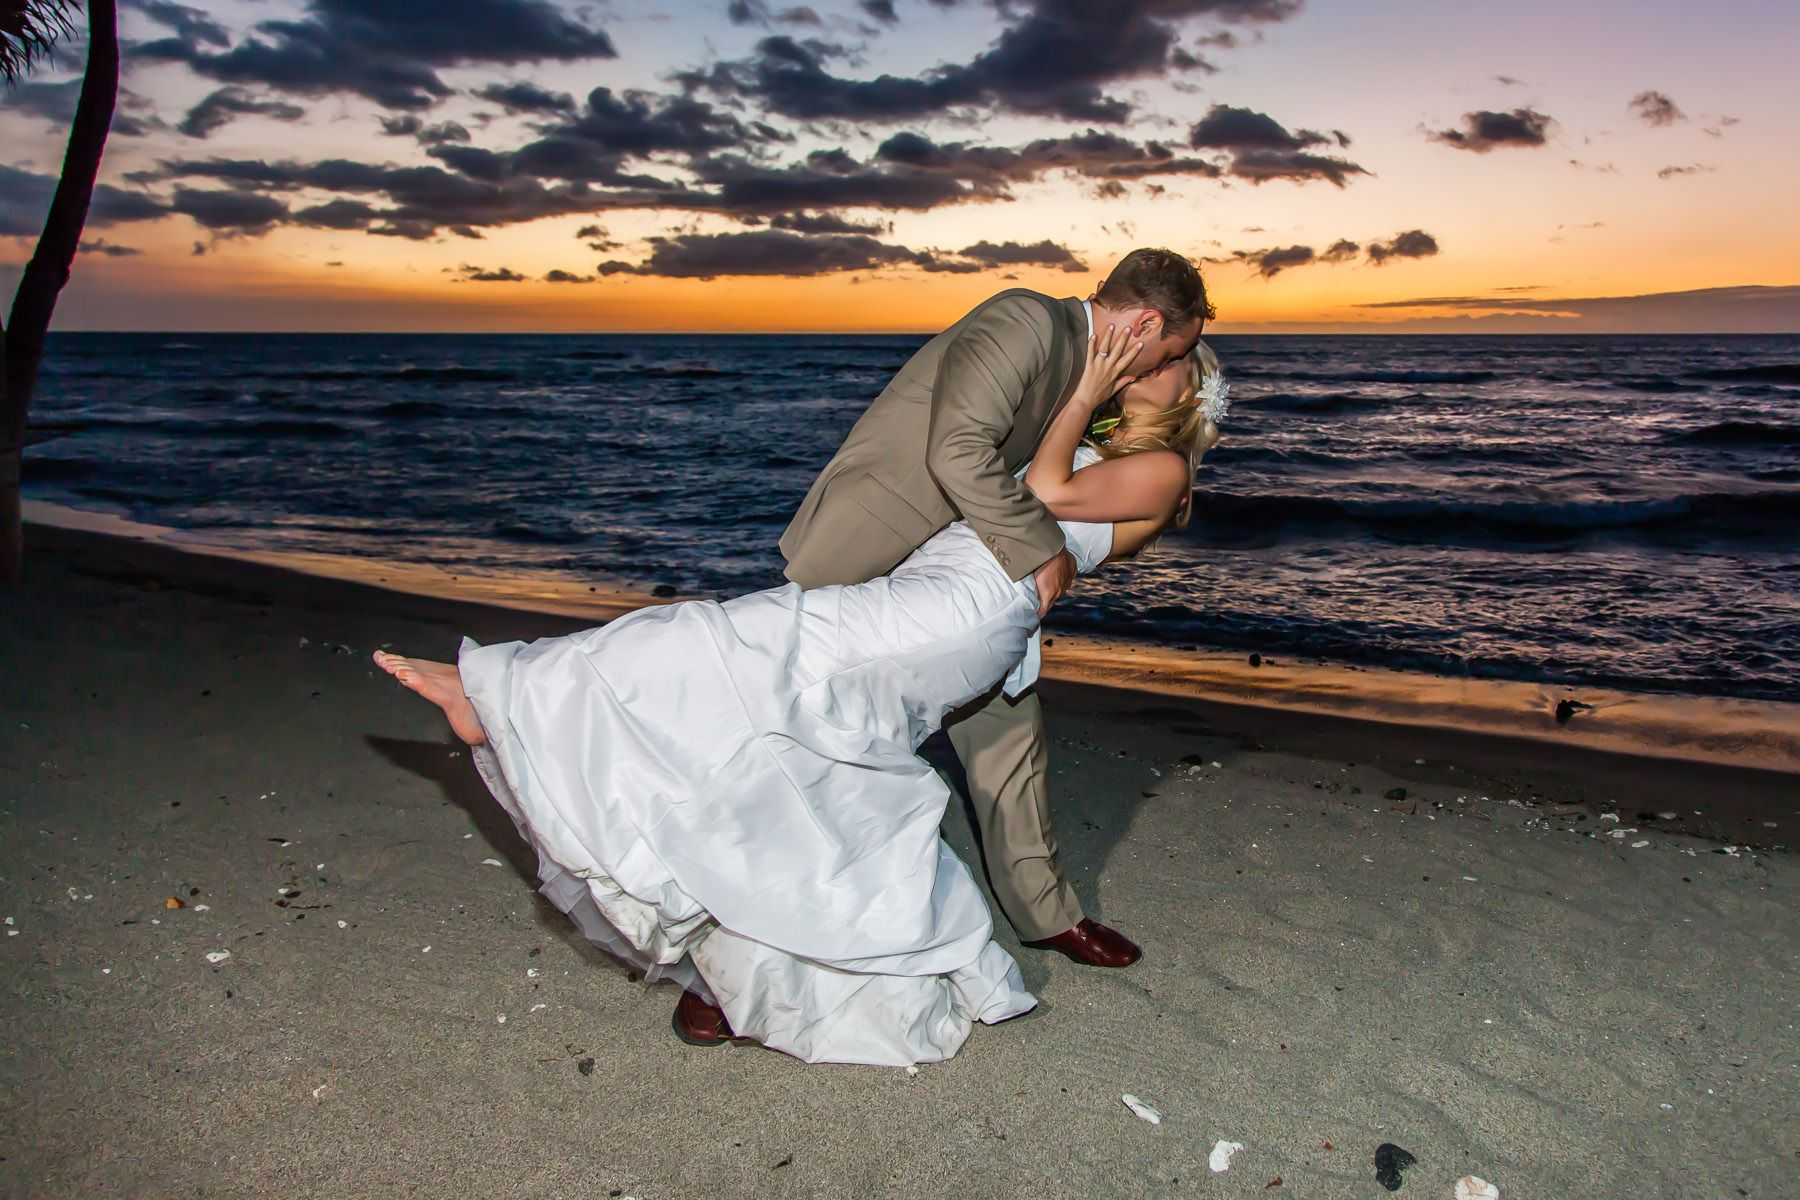 1kailua_kona__honolulu__hawaii__wedding__photographer_1186